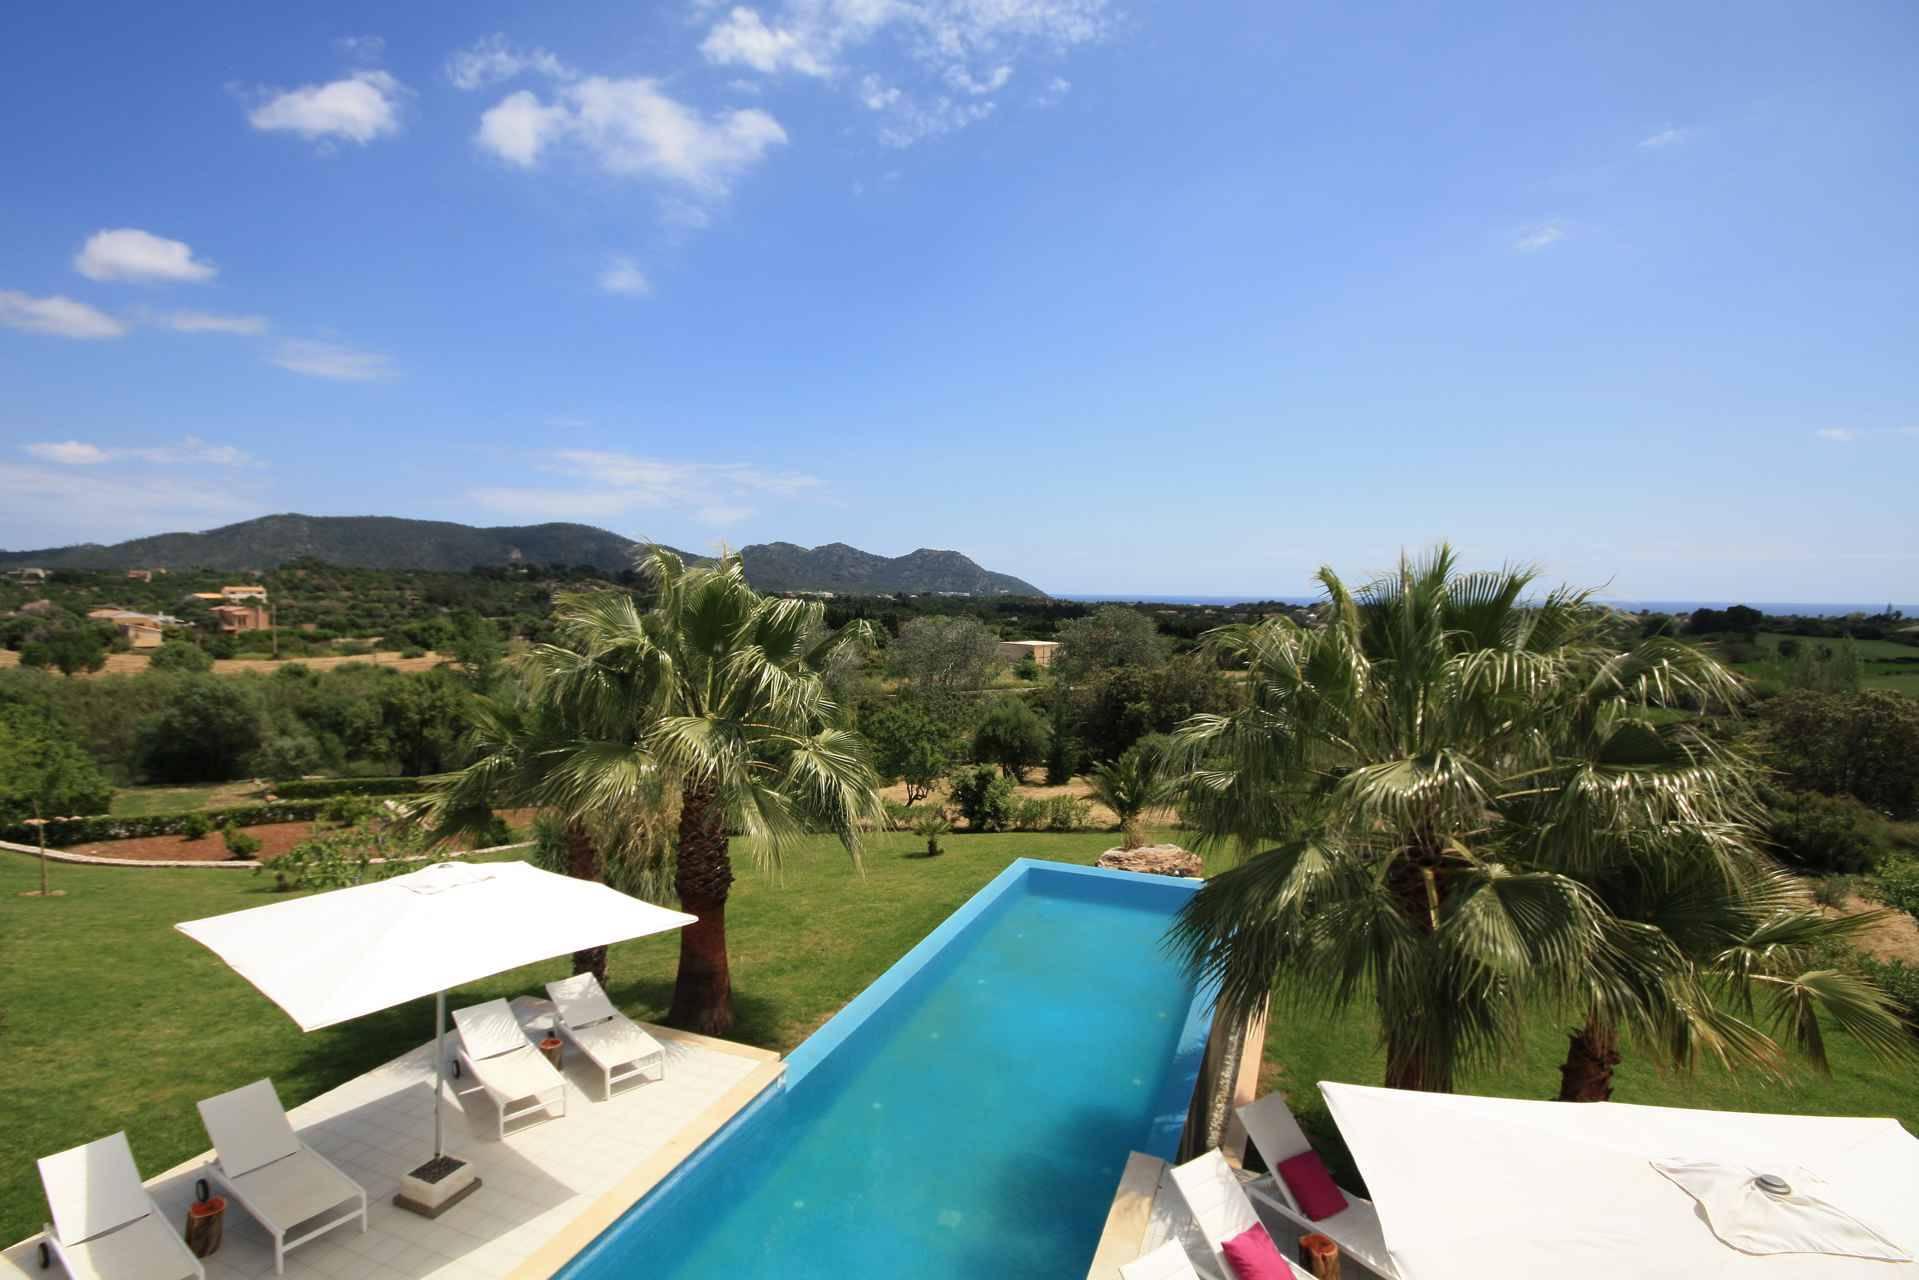 01-28 Luxus Finca Mallorca Nordosten Bild 12